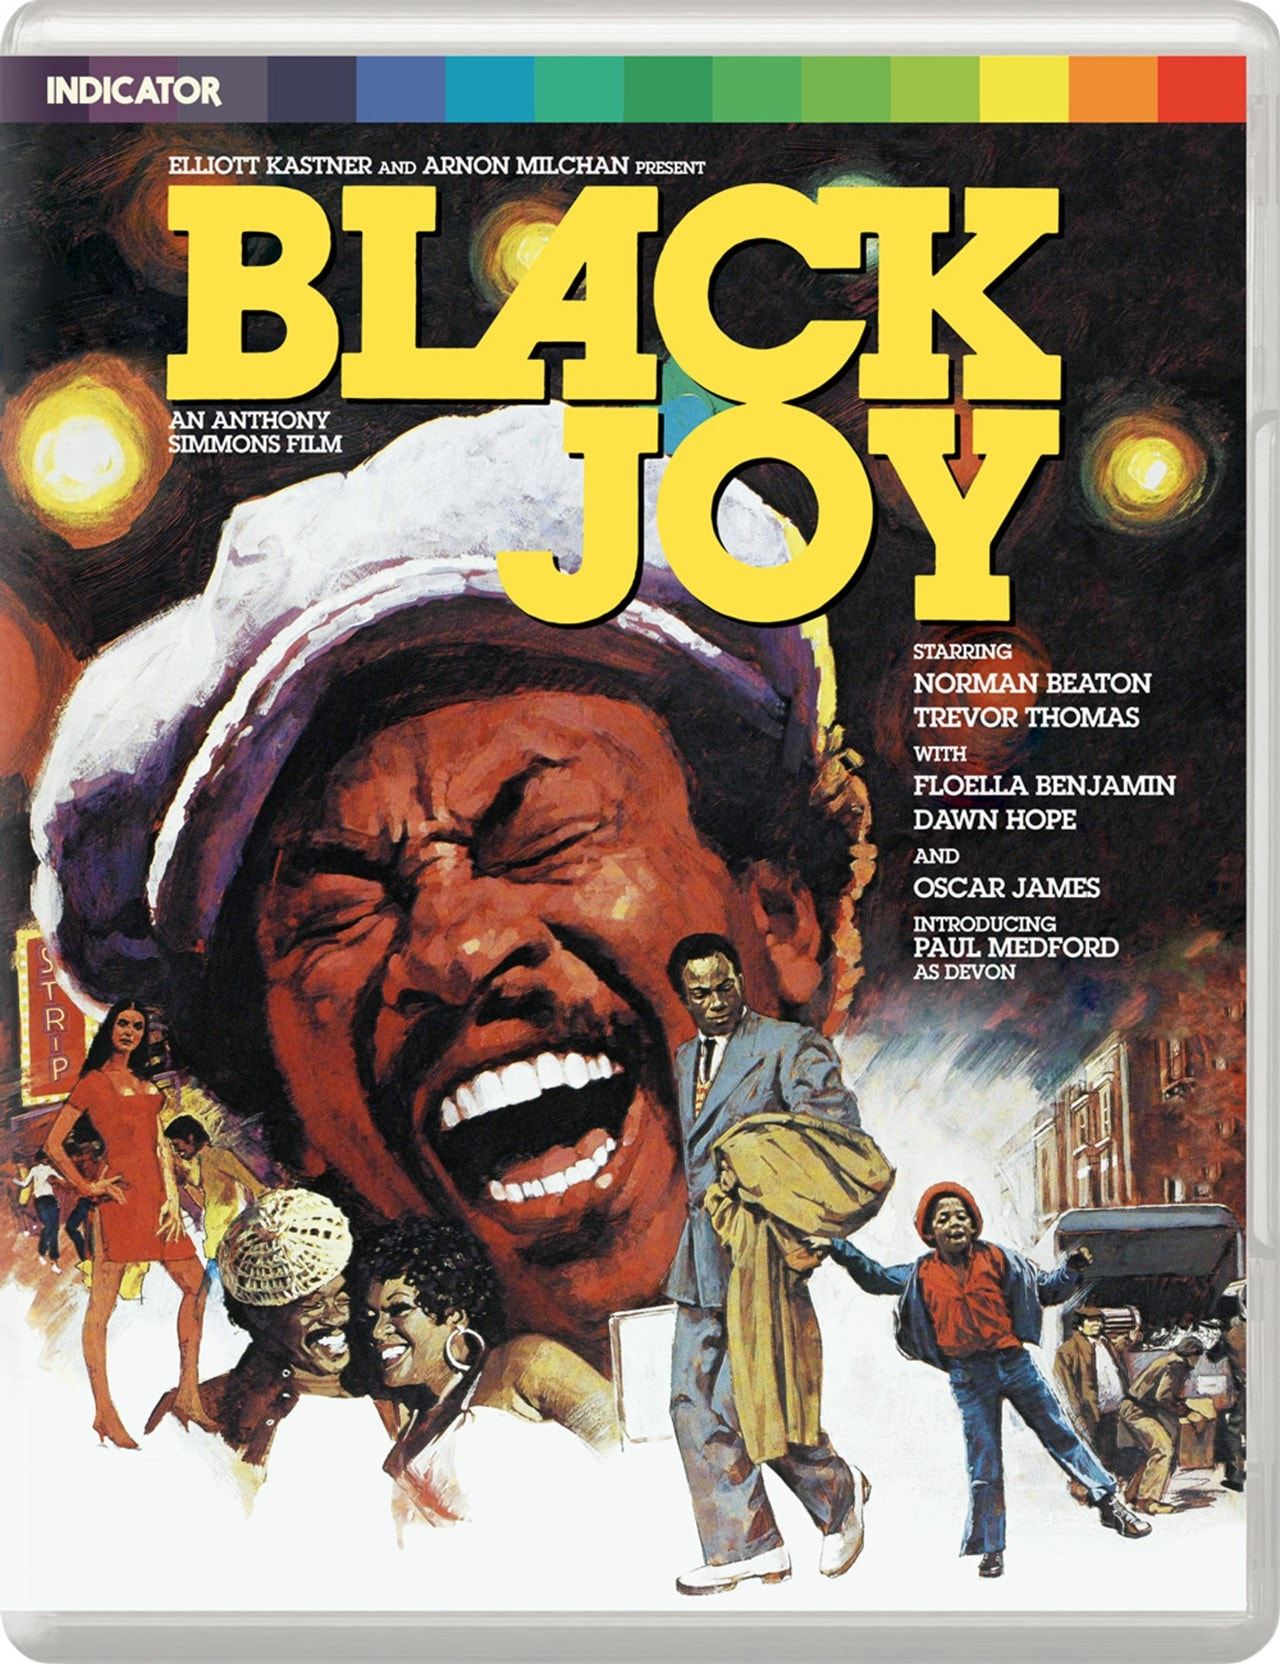 Black Joy - 1